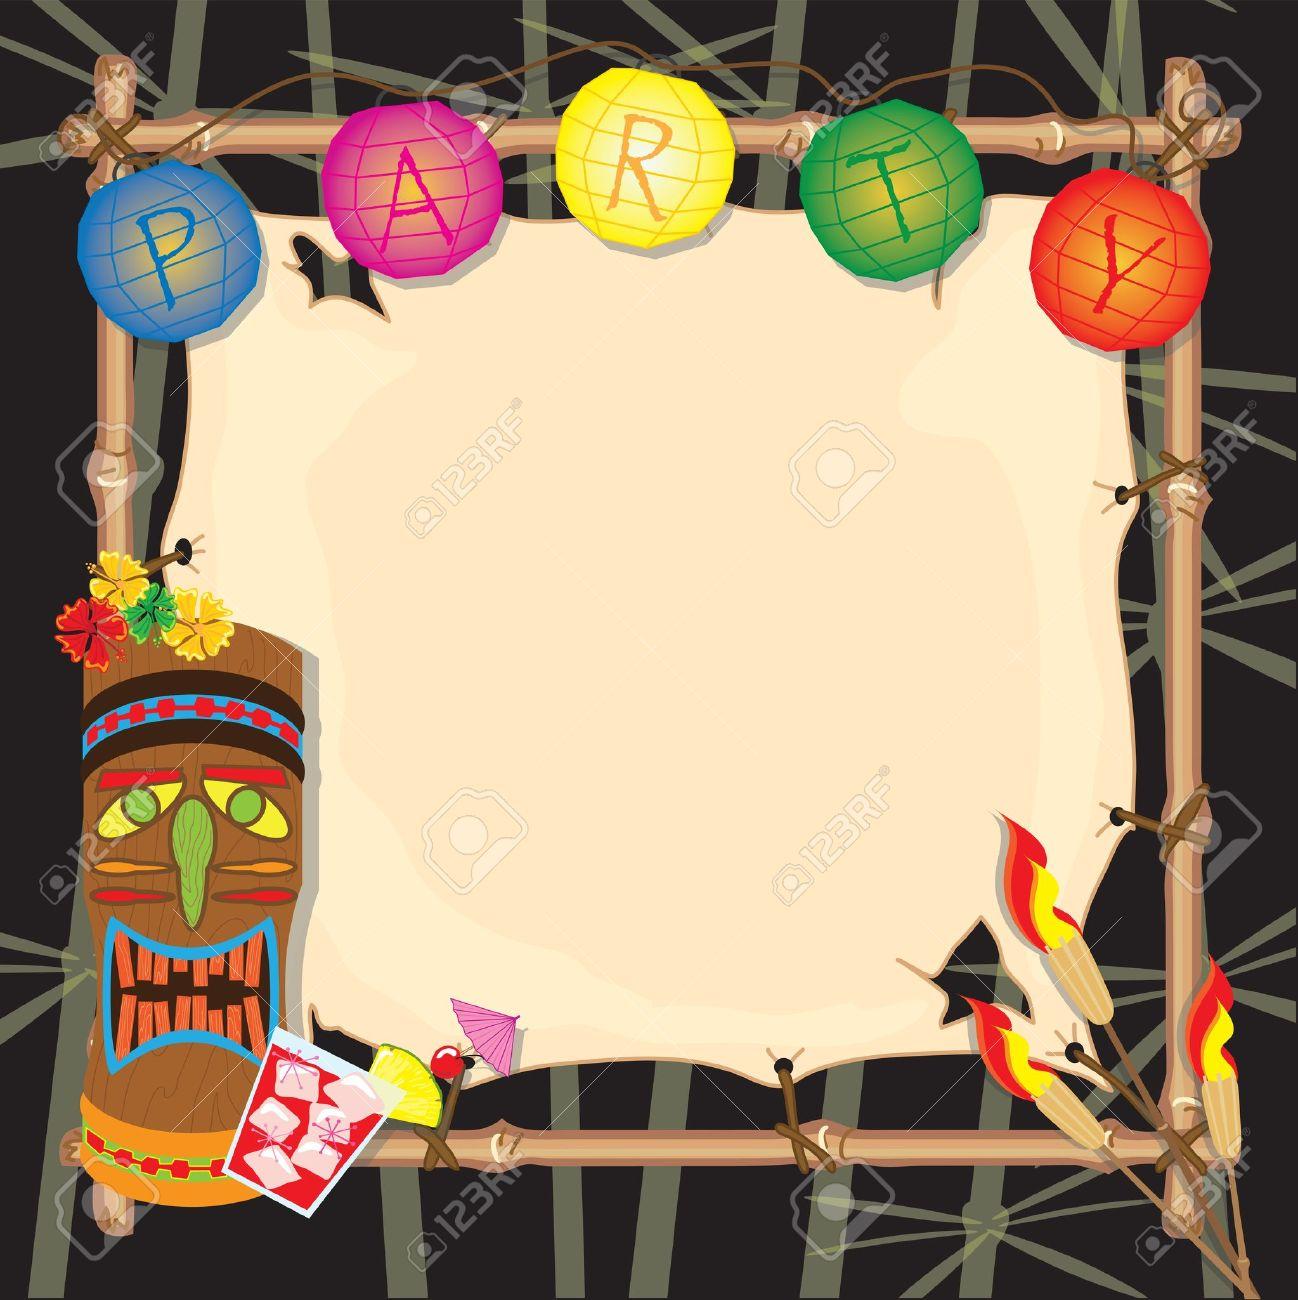 Tropical retro tiki or luau party invitation royalty free cliparts tropical retro tiki or luau party invitation stock vector 13387671 stopboris Gallery